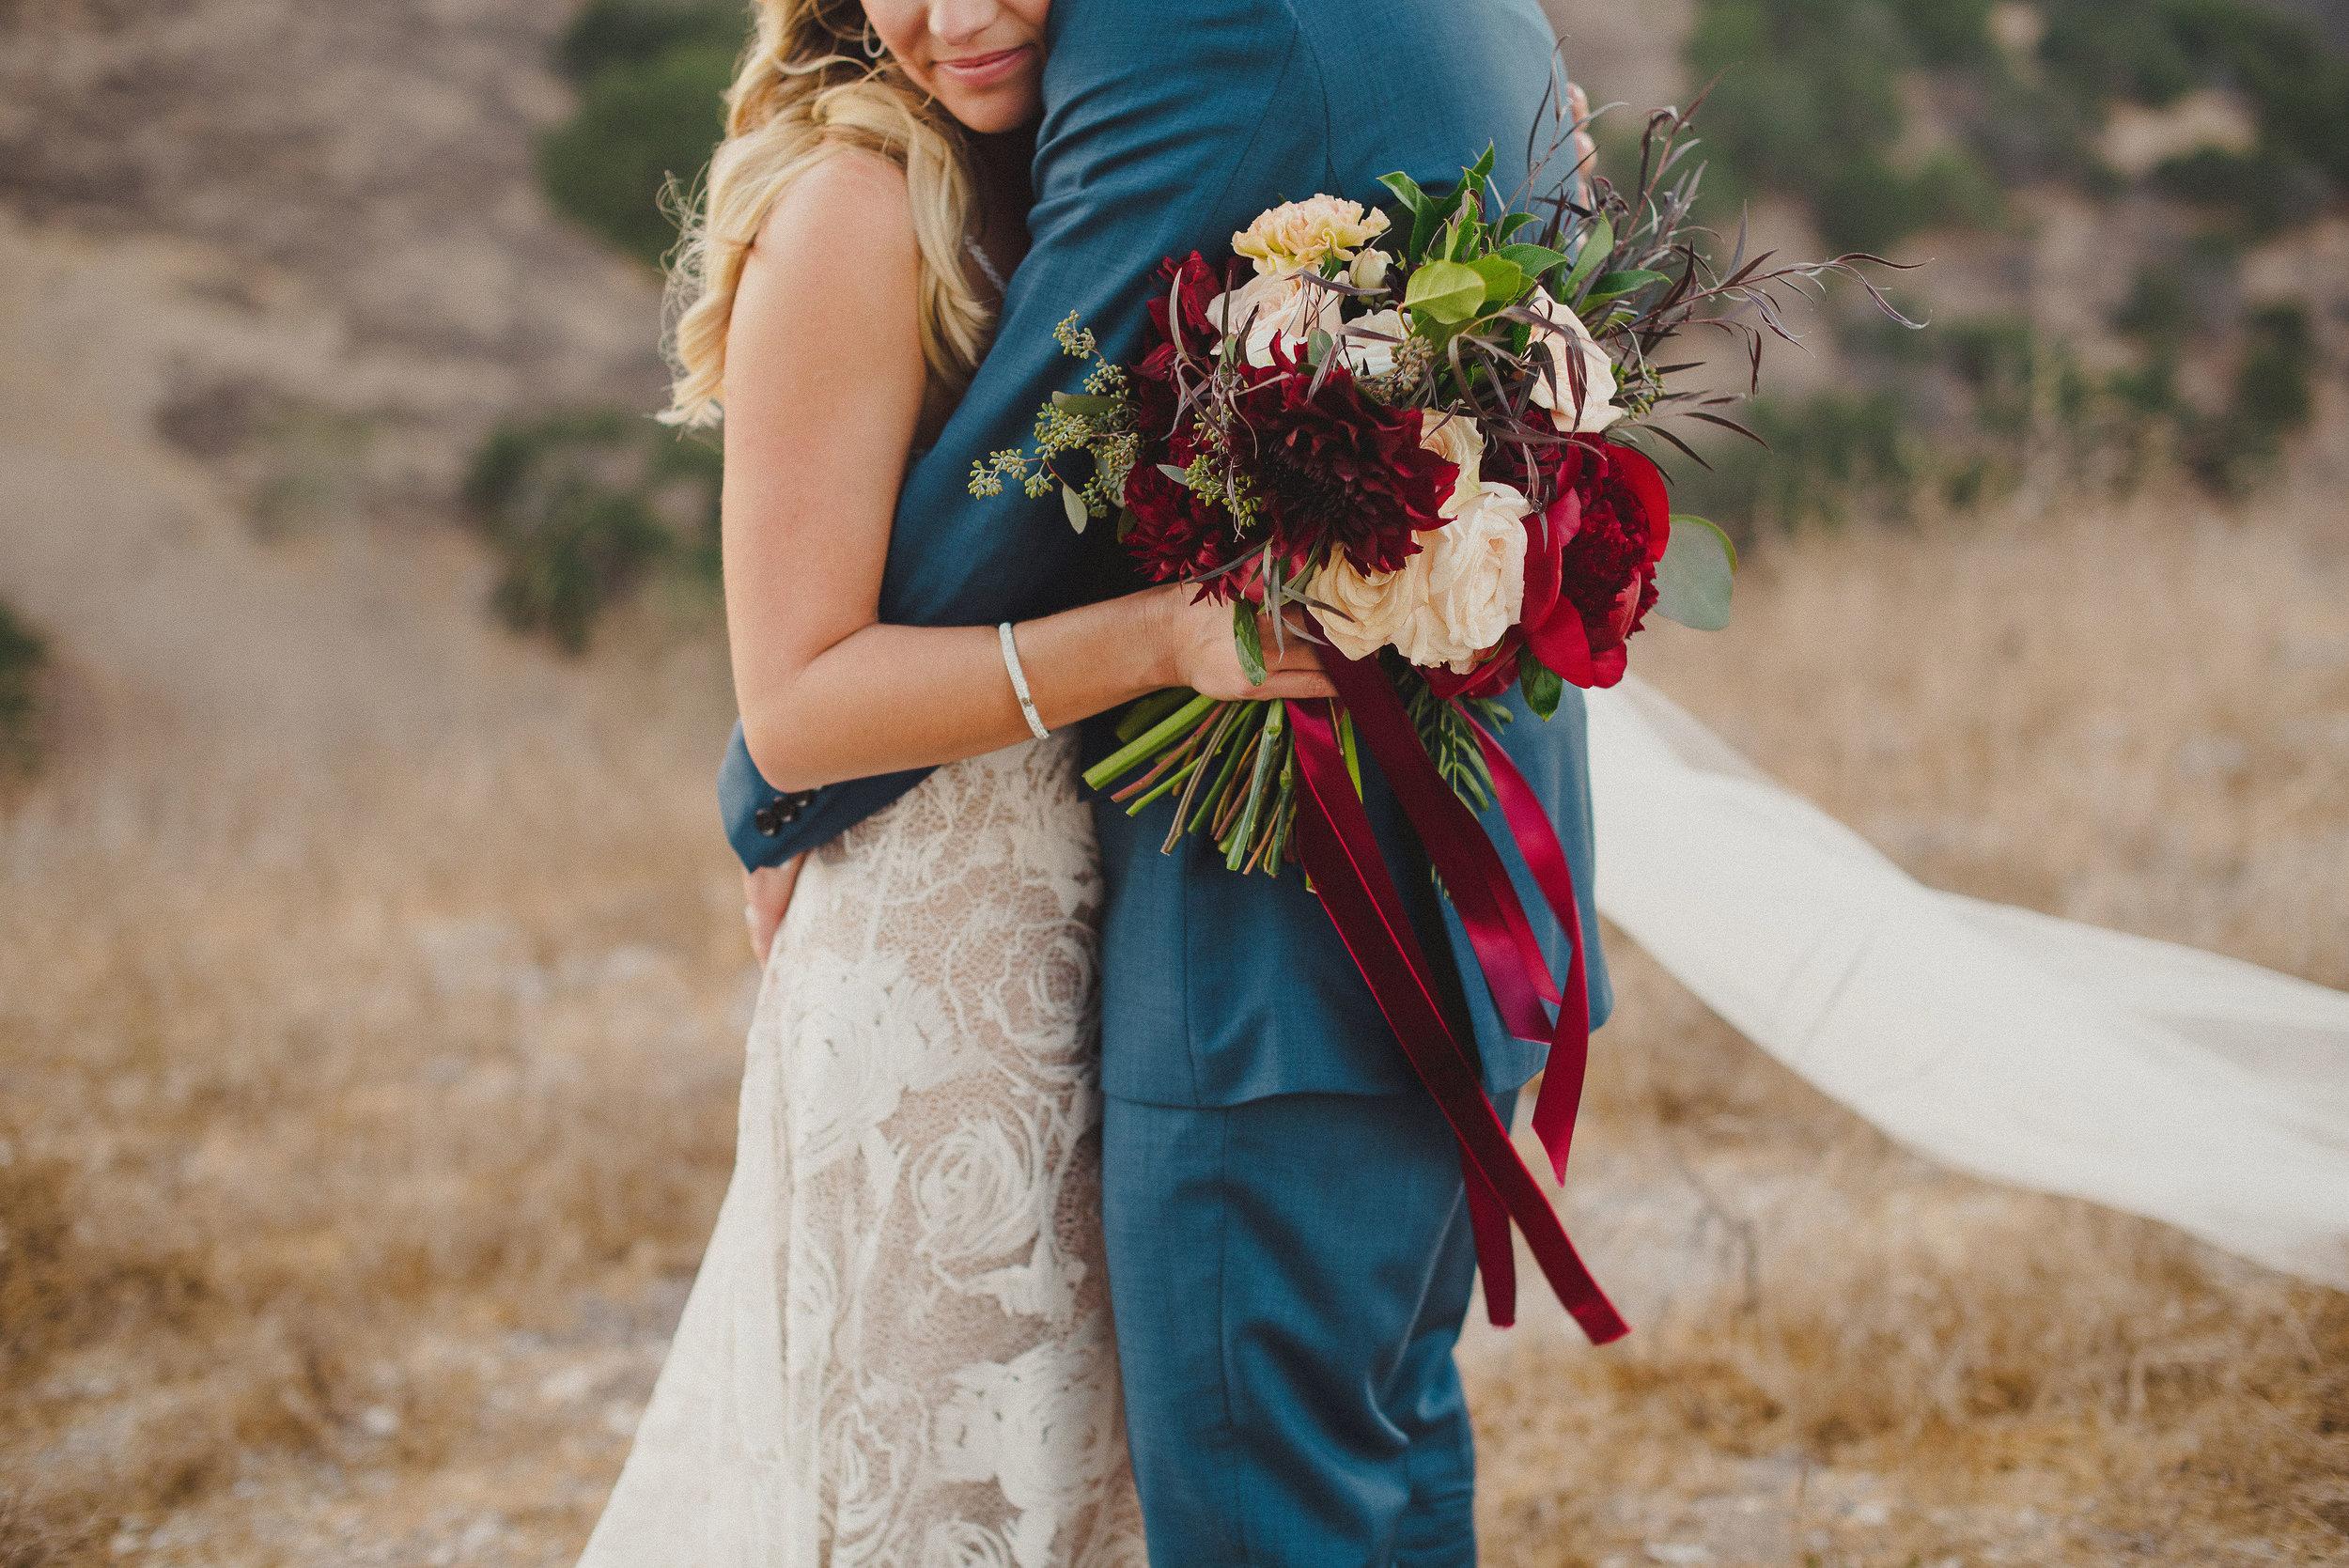 181026-Marisa-JB-Wedding-5471.jpg